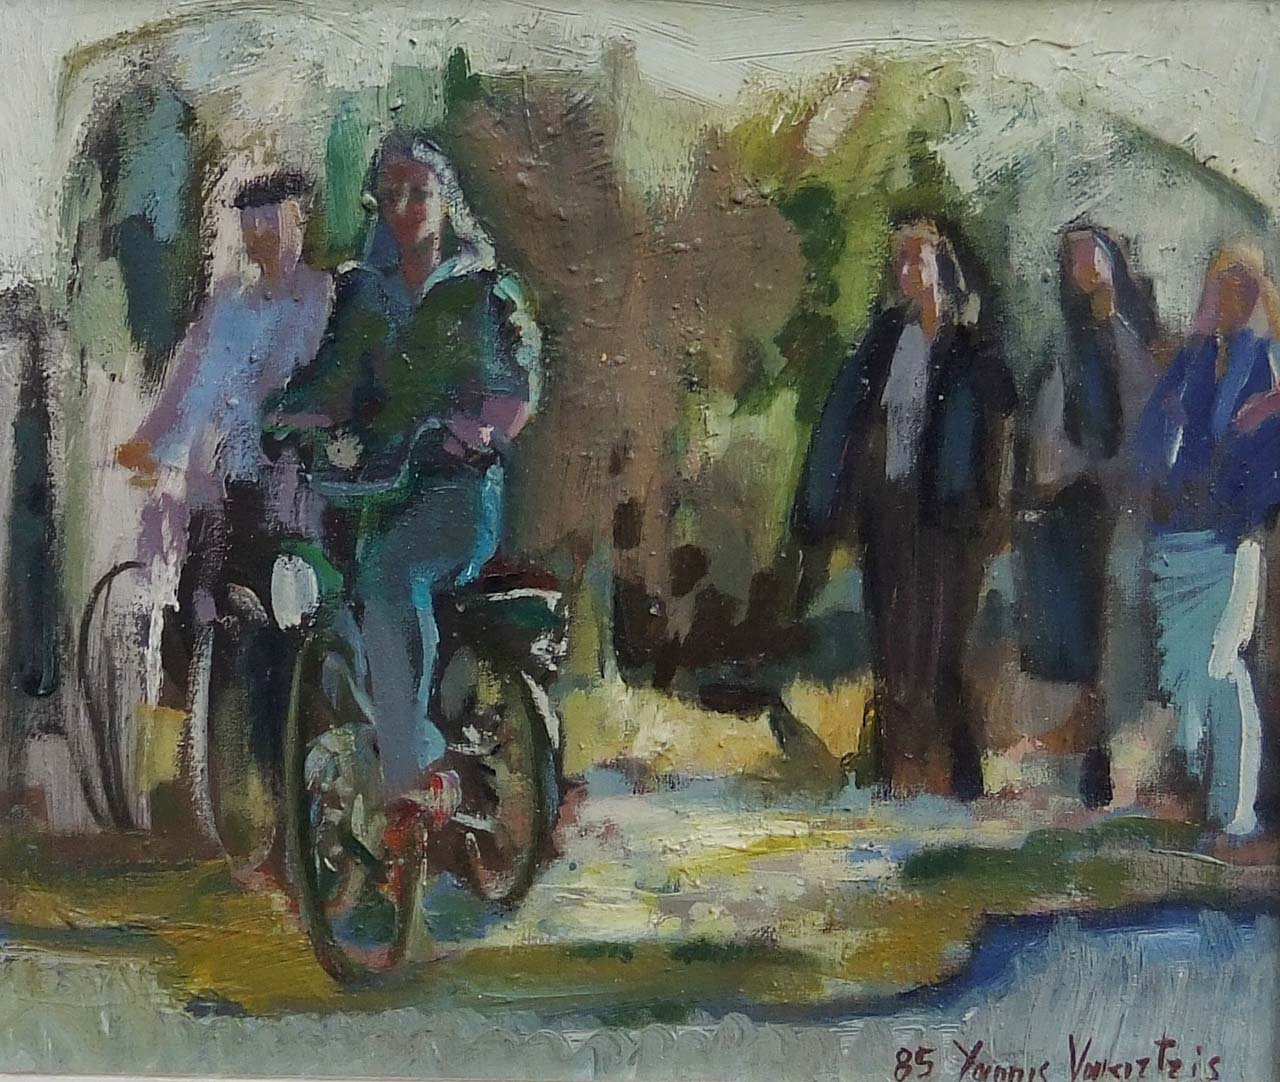 073. VAKIRTZIS Yannis (1957)